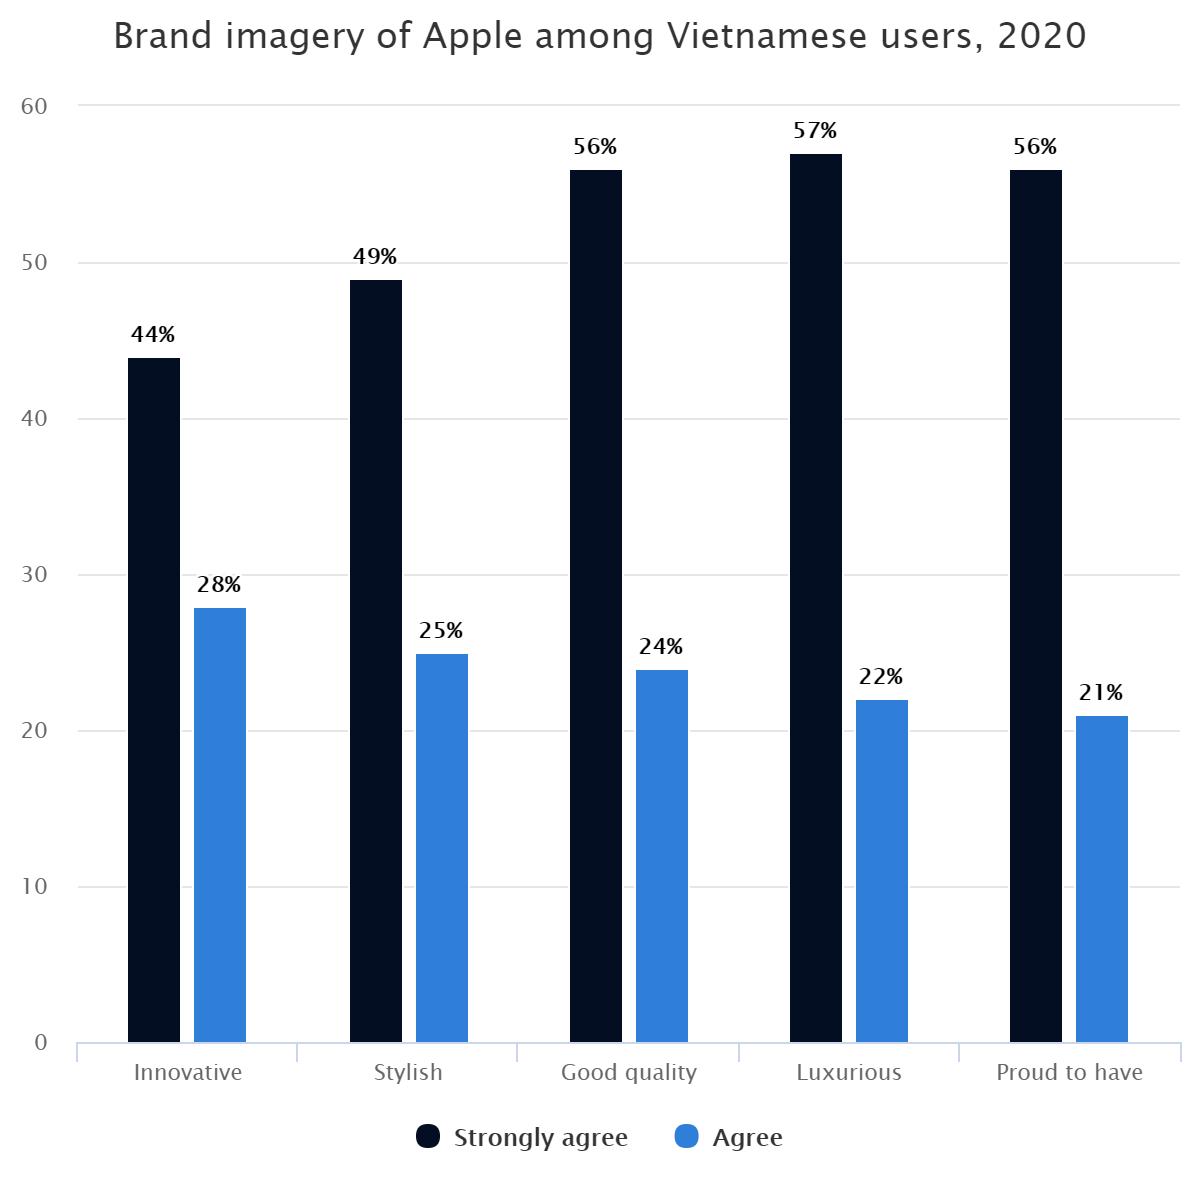 Brand imagery of Apple among Vietnamese users, 2020